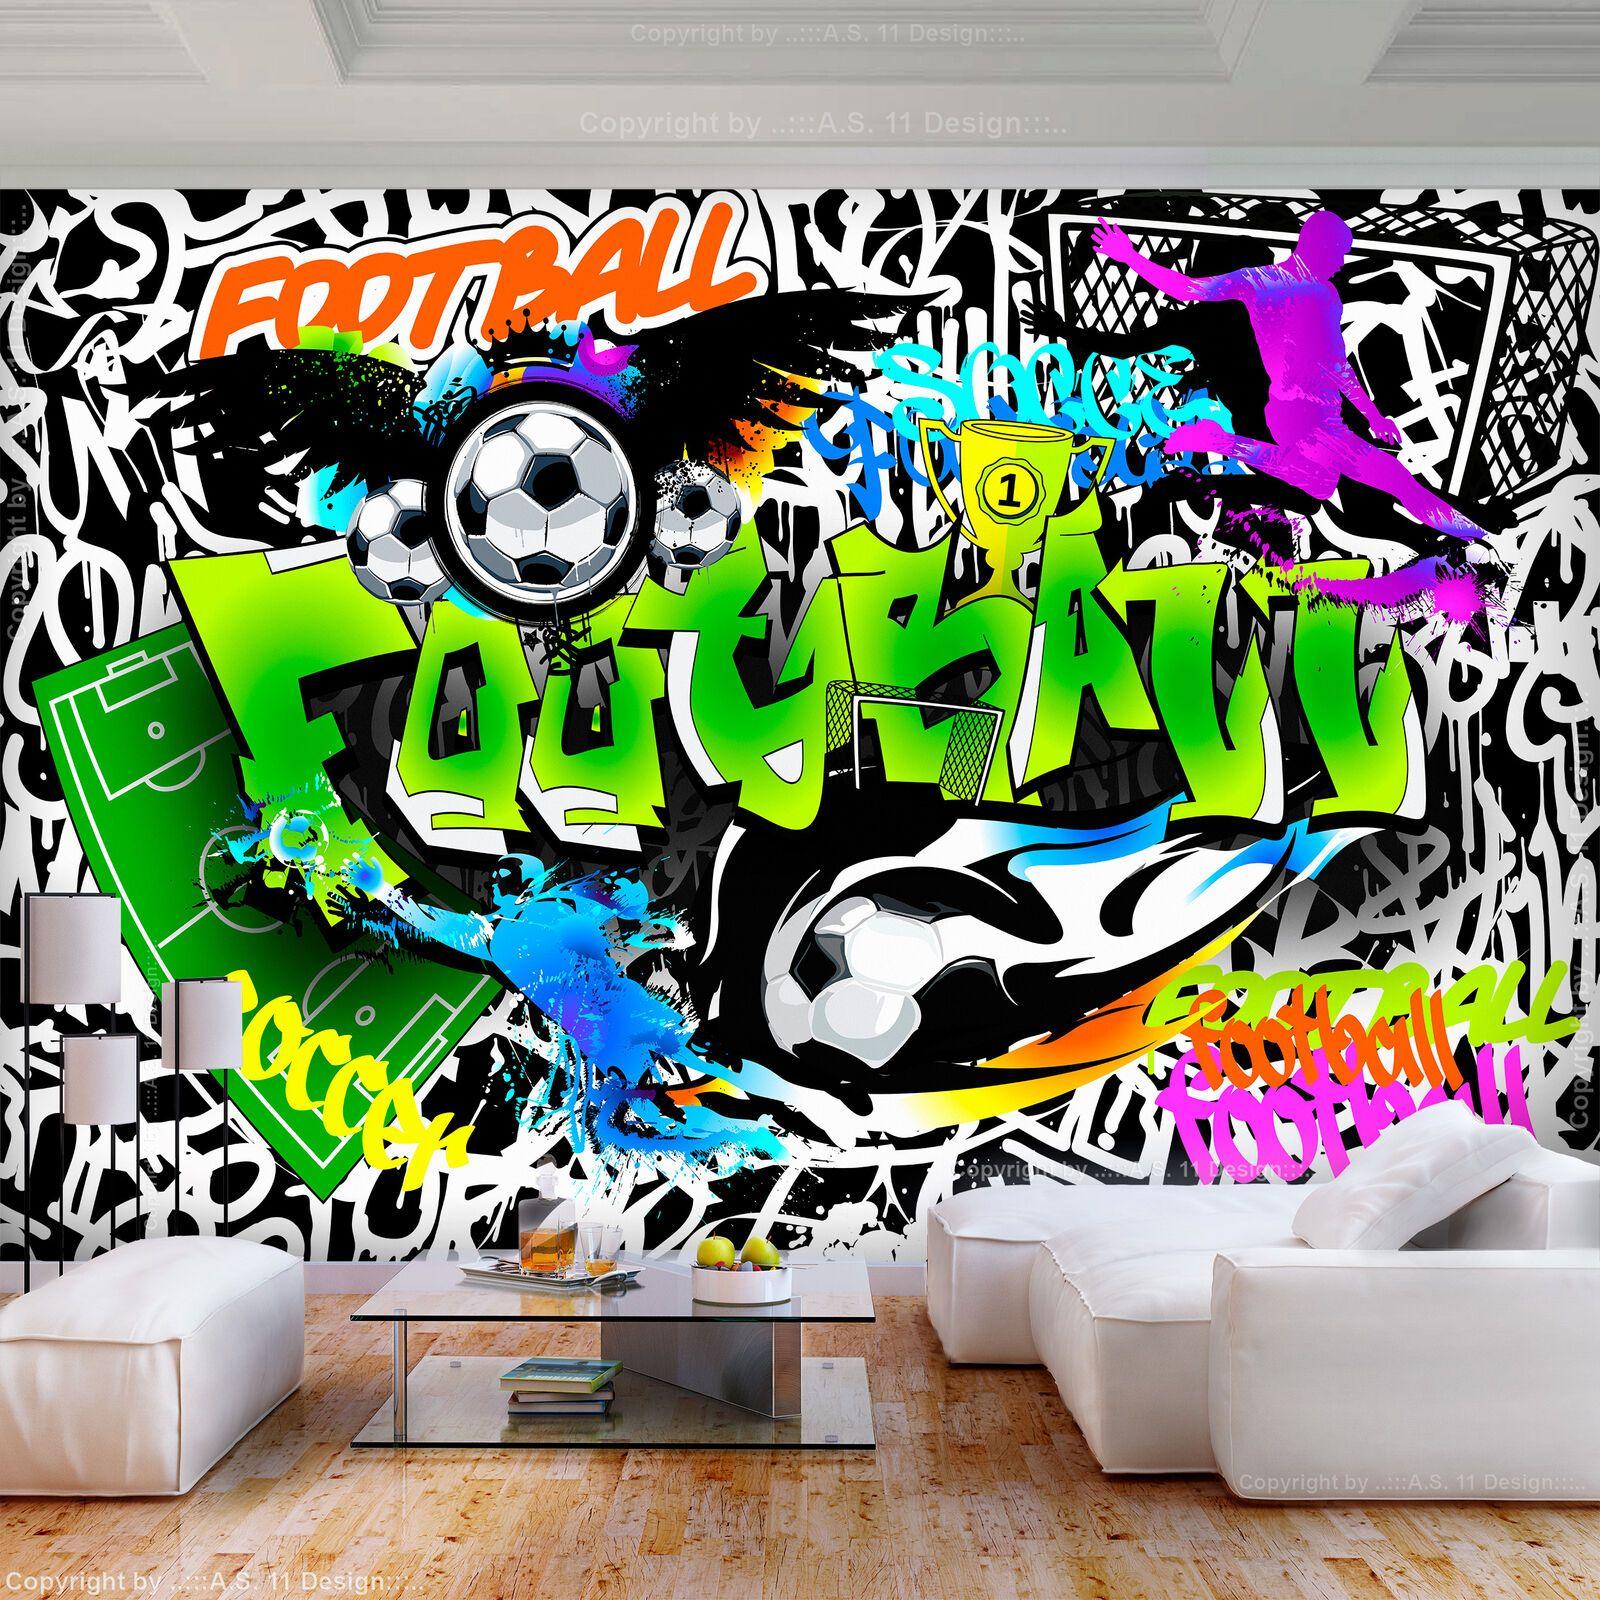 VLIES FOTOTAPETE GRAFFITI bunt Steinwand TAPETE Fußball ...